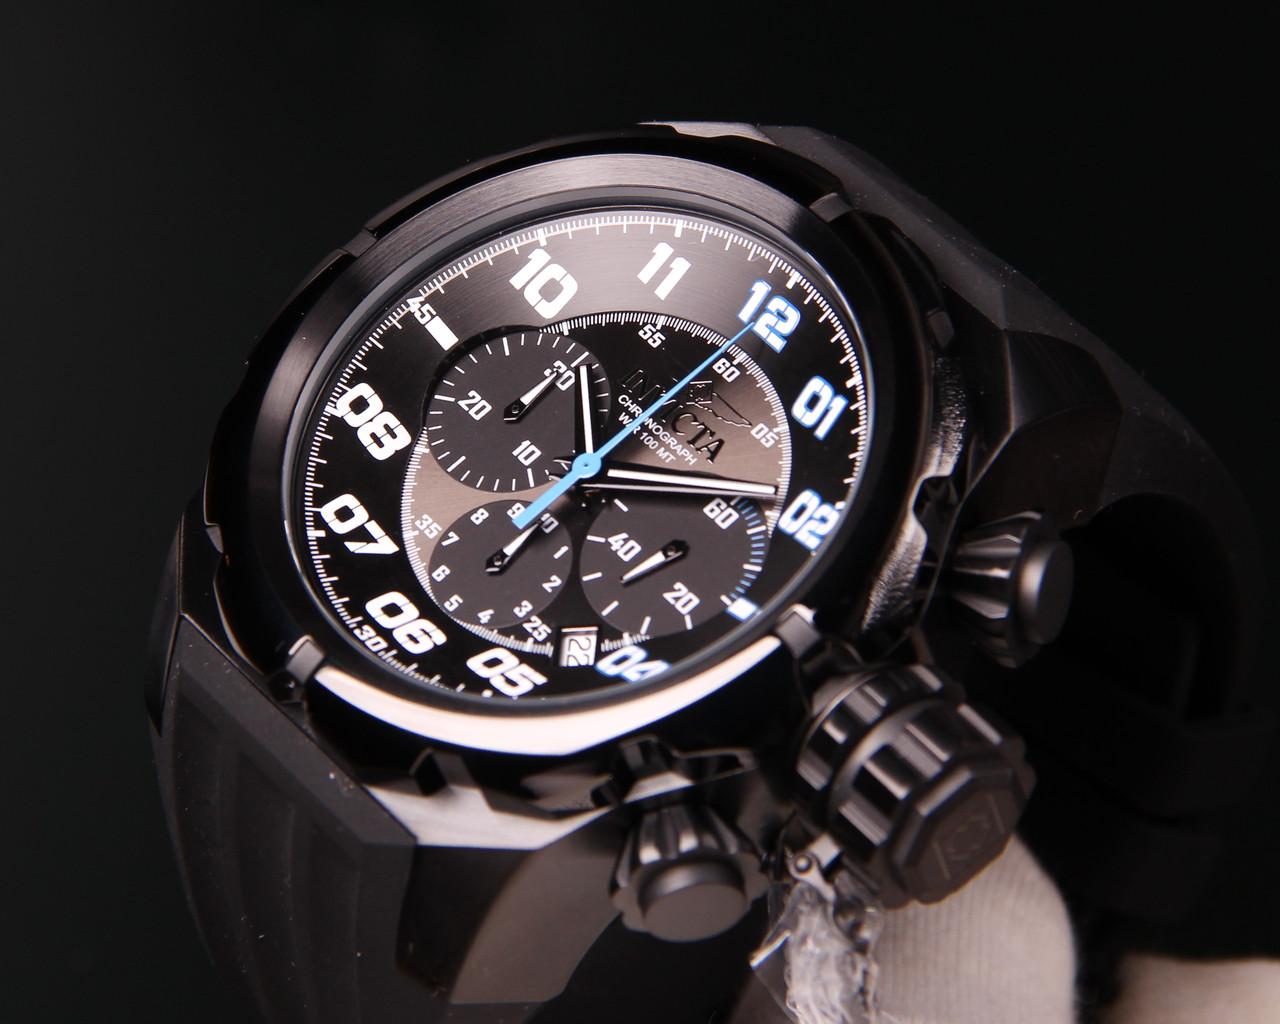 2ee27f54e0d8 Мужские часы Invicta 22420 Russian Diver, цена 5 727,50 грн., купить ...